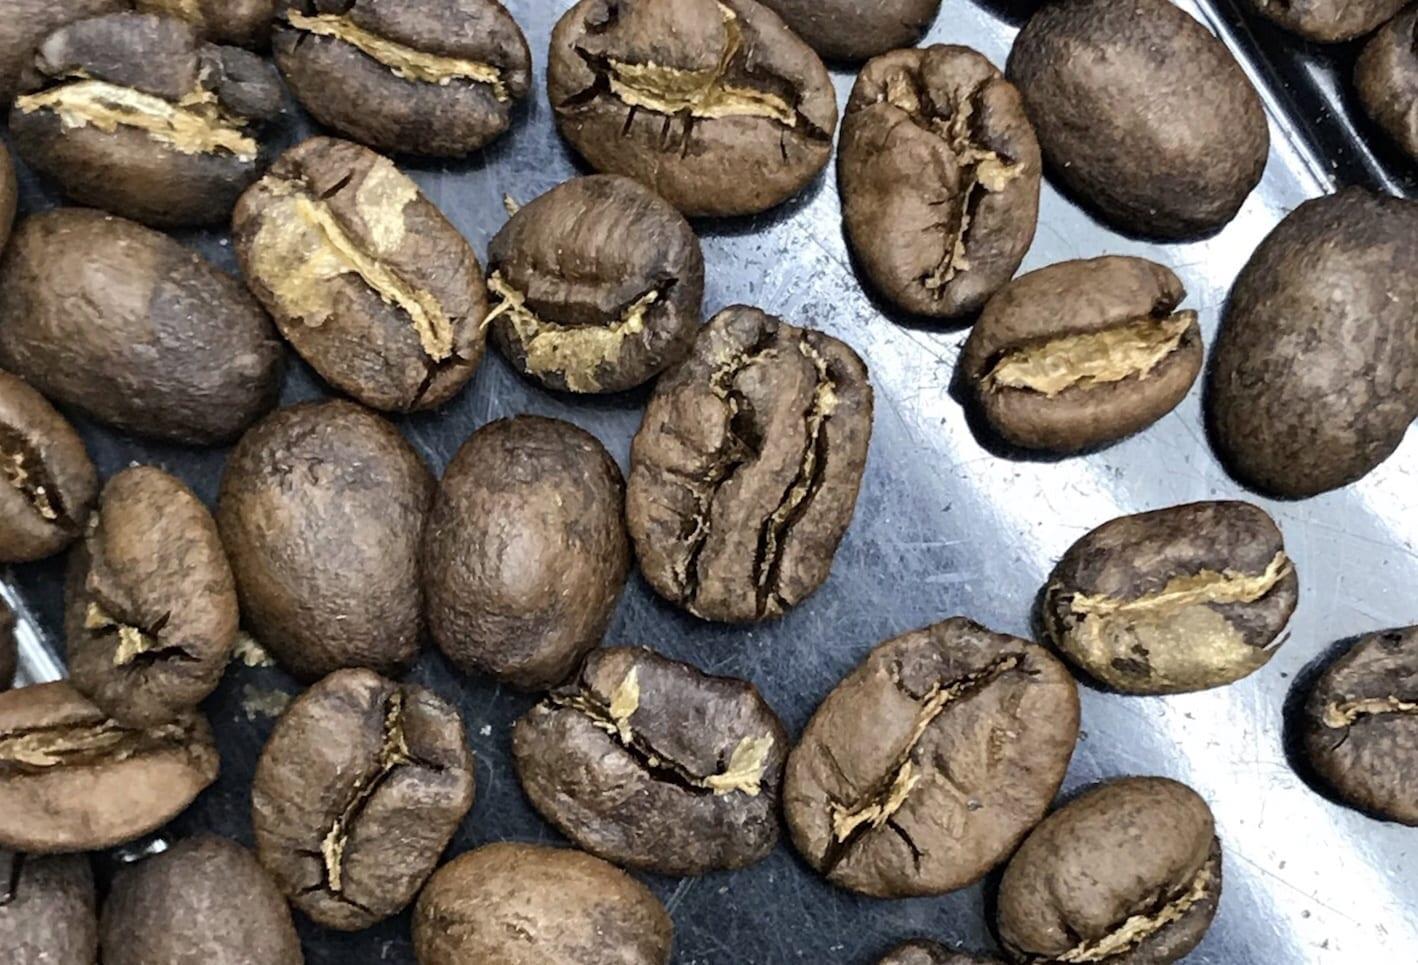 Roasted coffee sample from Okoro area